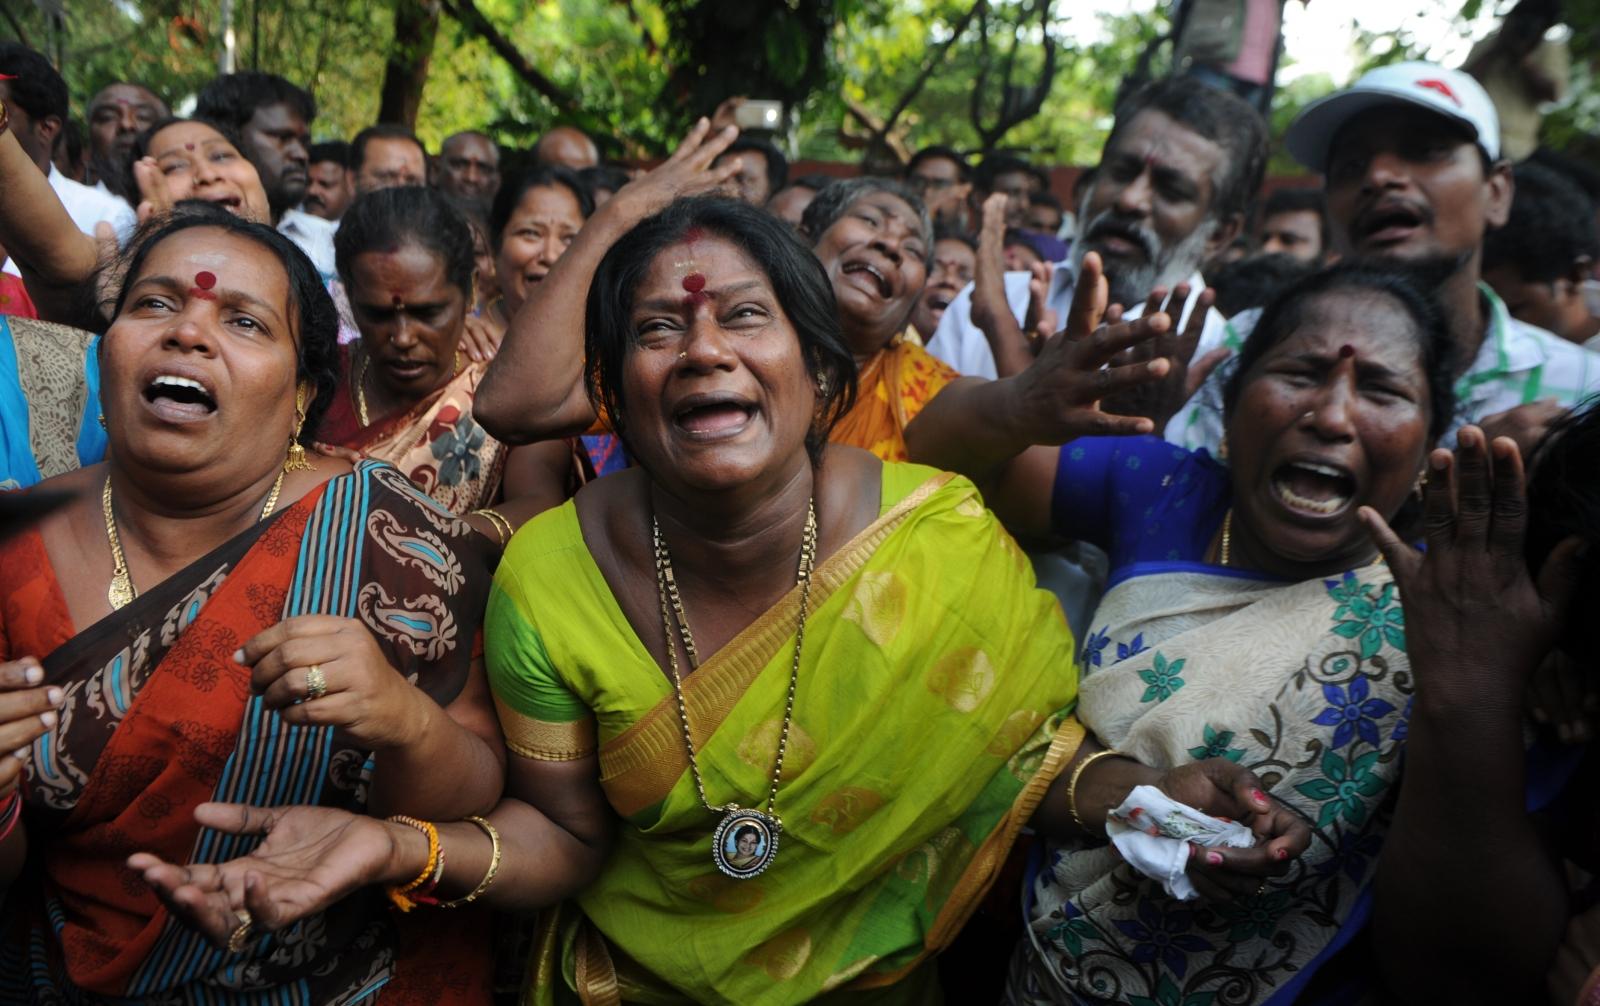 Top Indian politician Jayalalithaa Jayaram, Chief Minister of Tamil Nadu, dies aged 68